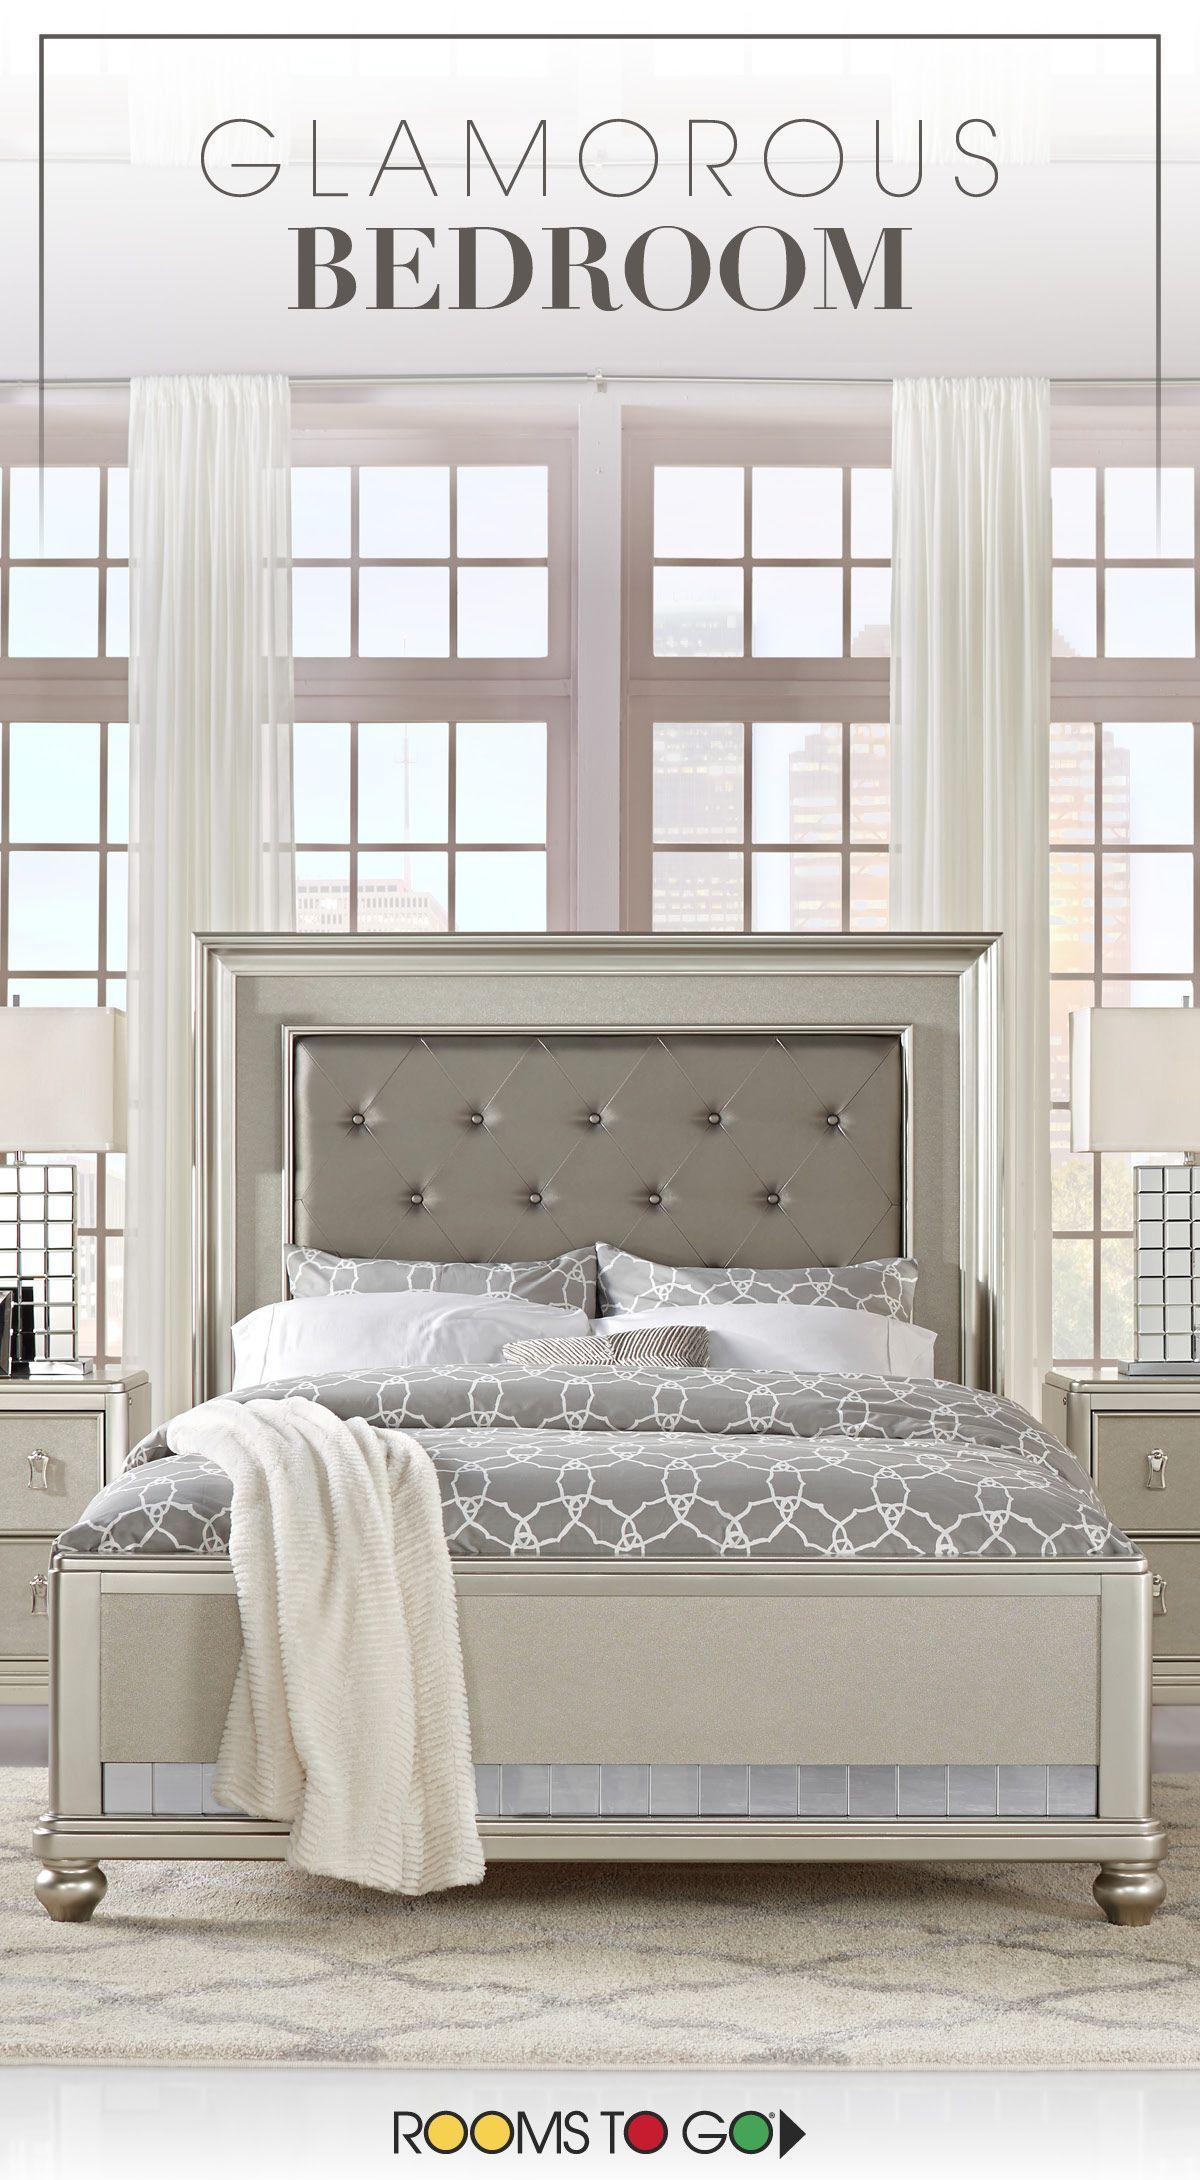 13 Elegant Ideas How To Craft Glamorous Bedroom Furniture Rooms To Go Bedroom Glamourous Bedroom King Bedroom Sets